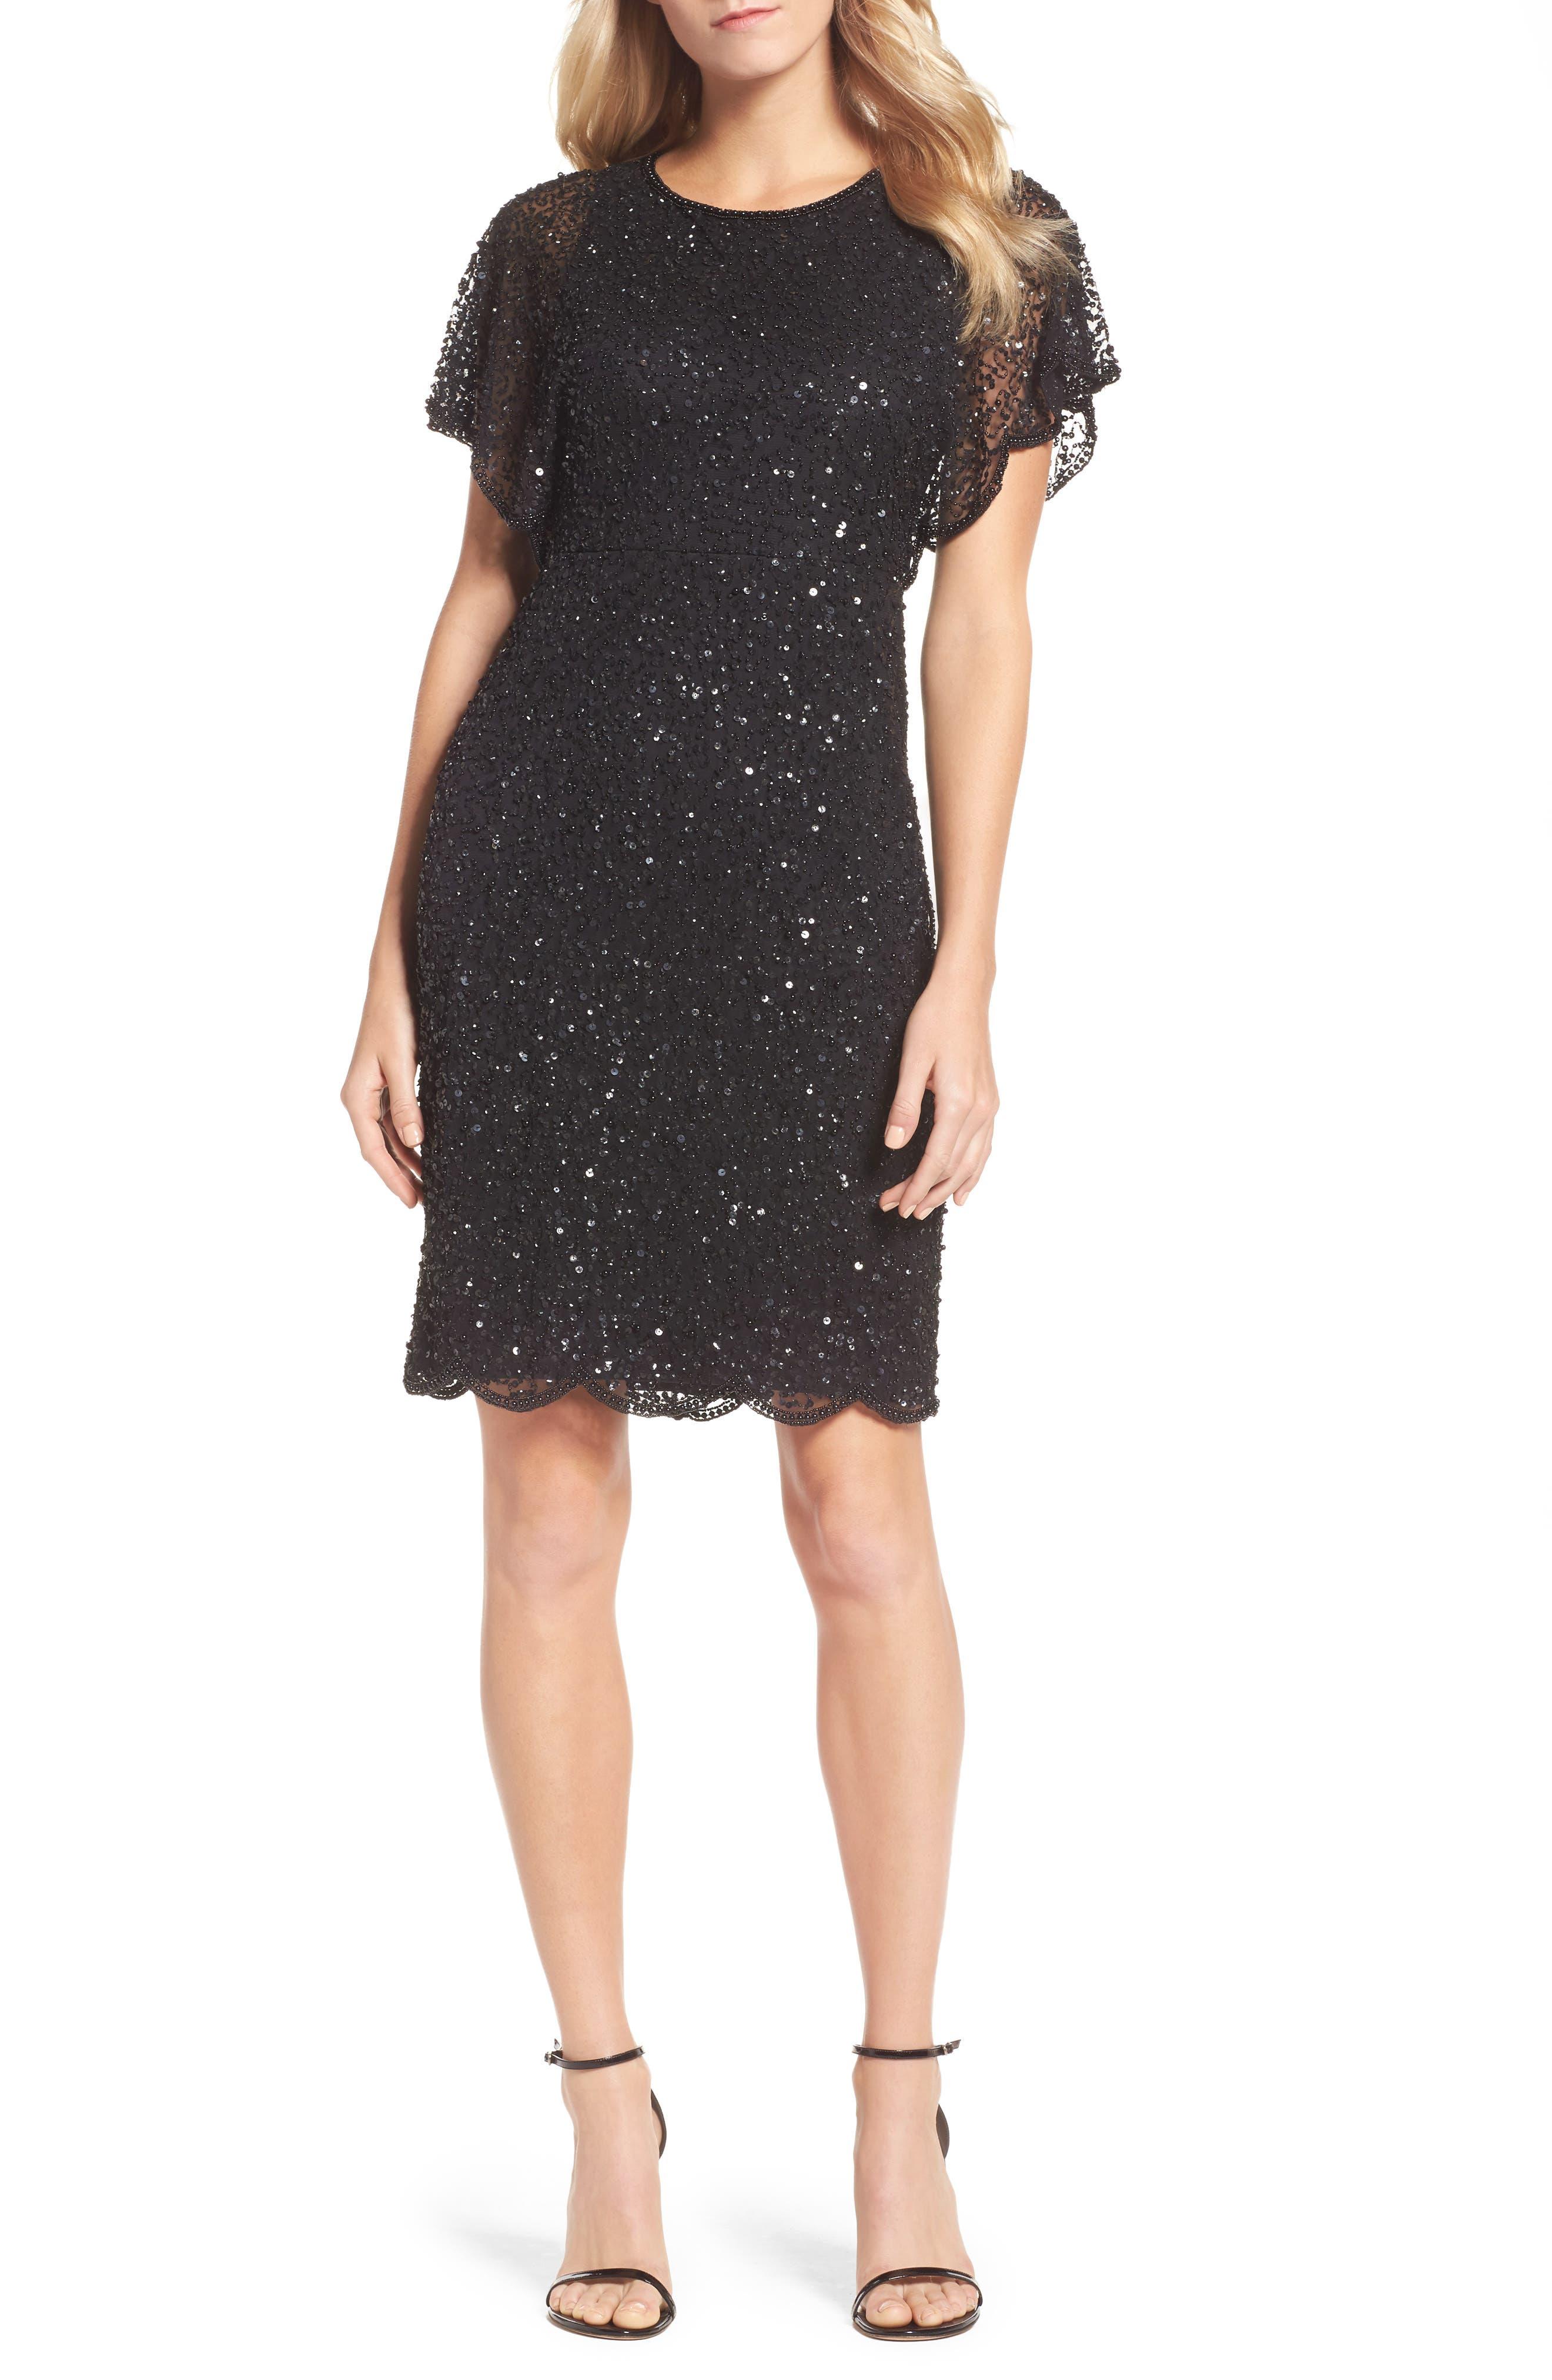 Alternate Image 1 Selected - Adrianna Papell Embellished Flutter Sleeve Cocktail Dress